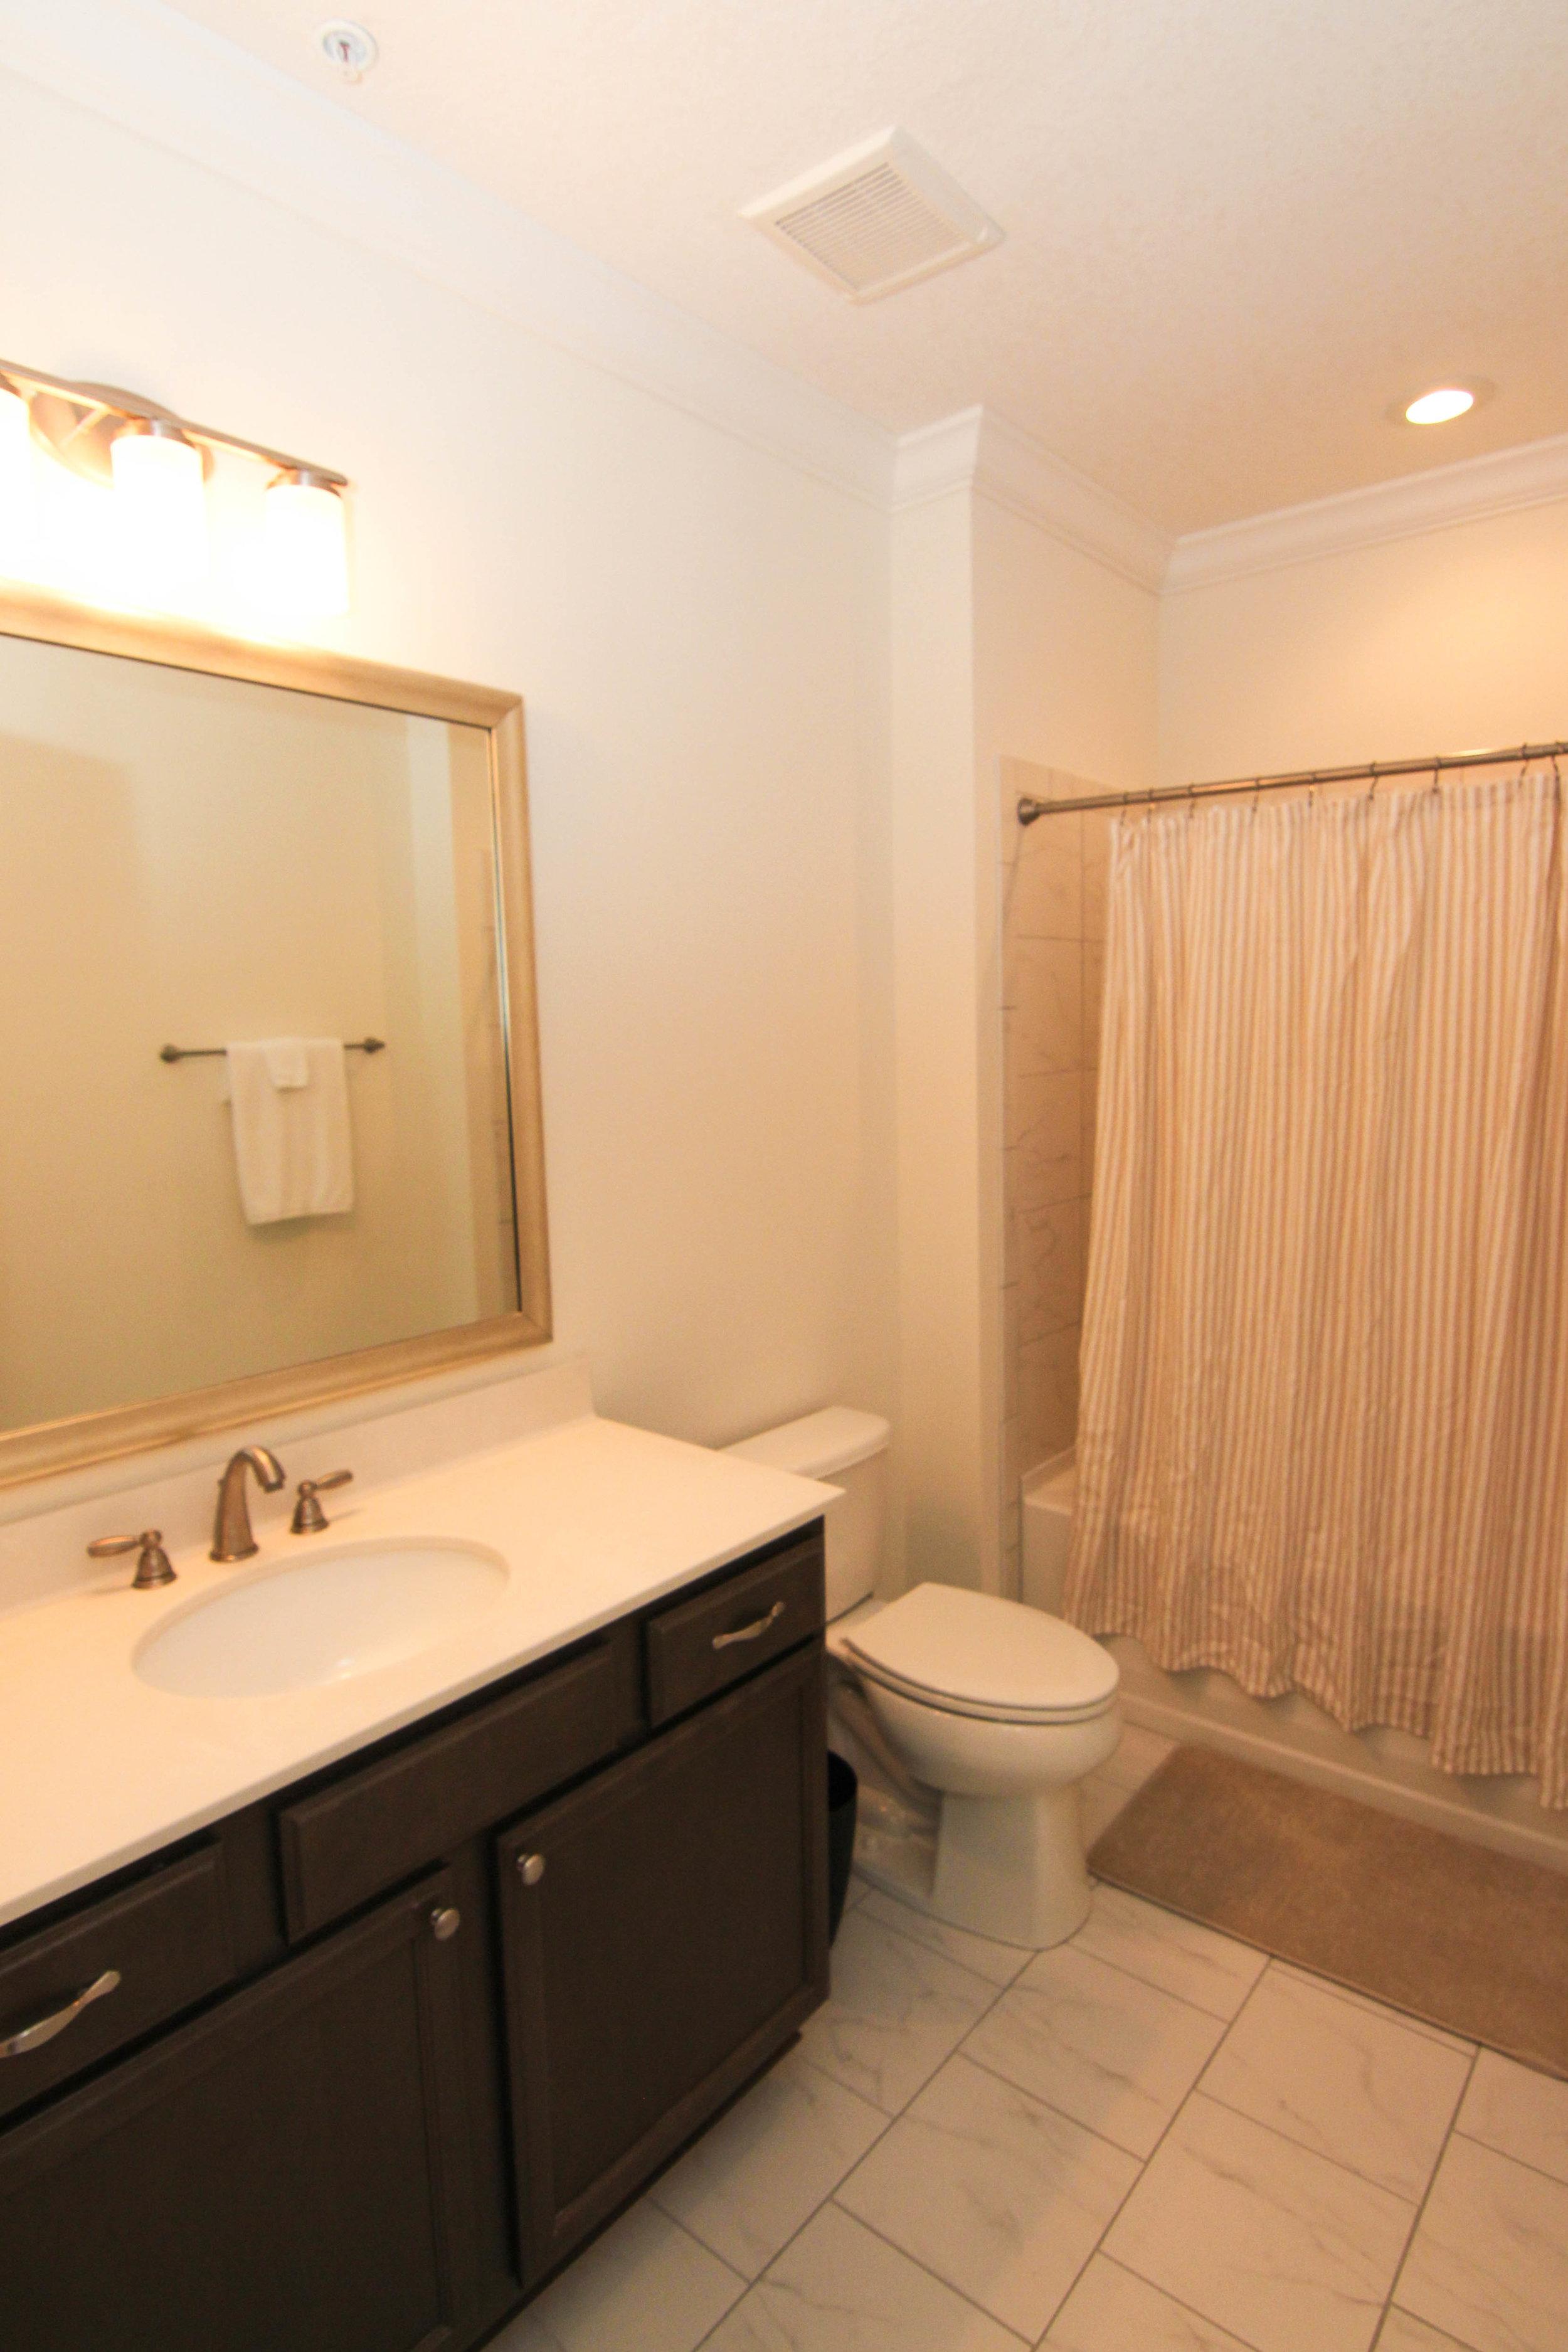 23 Bathroom 2.jpg